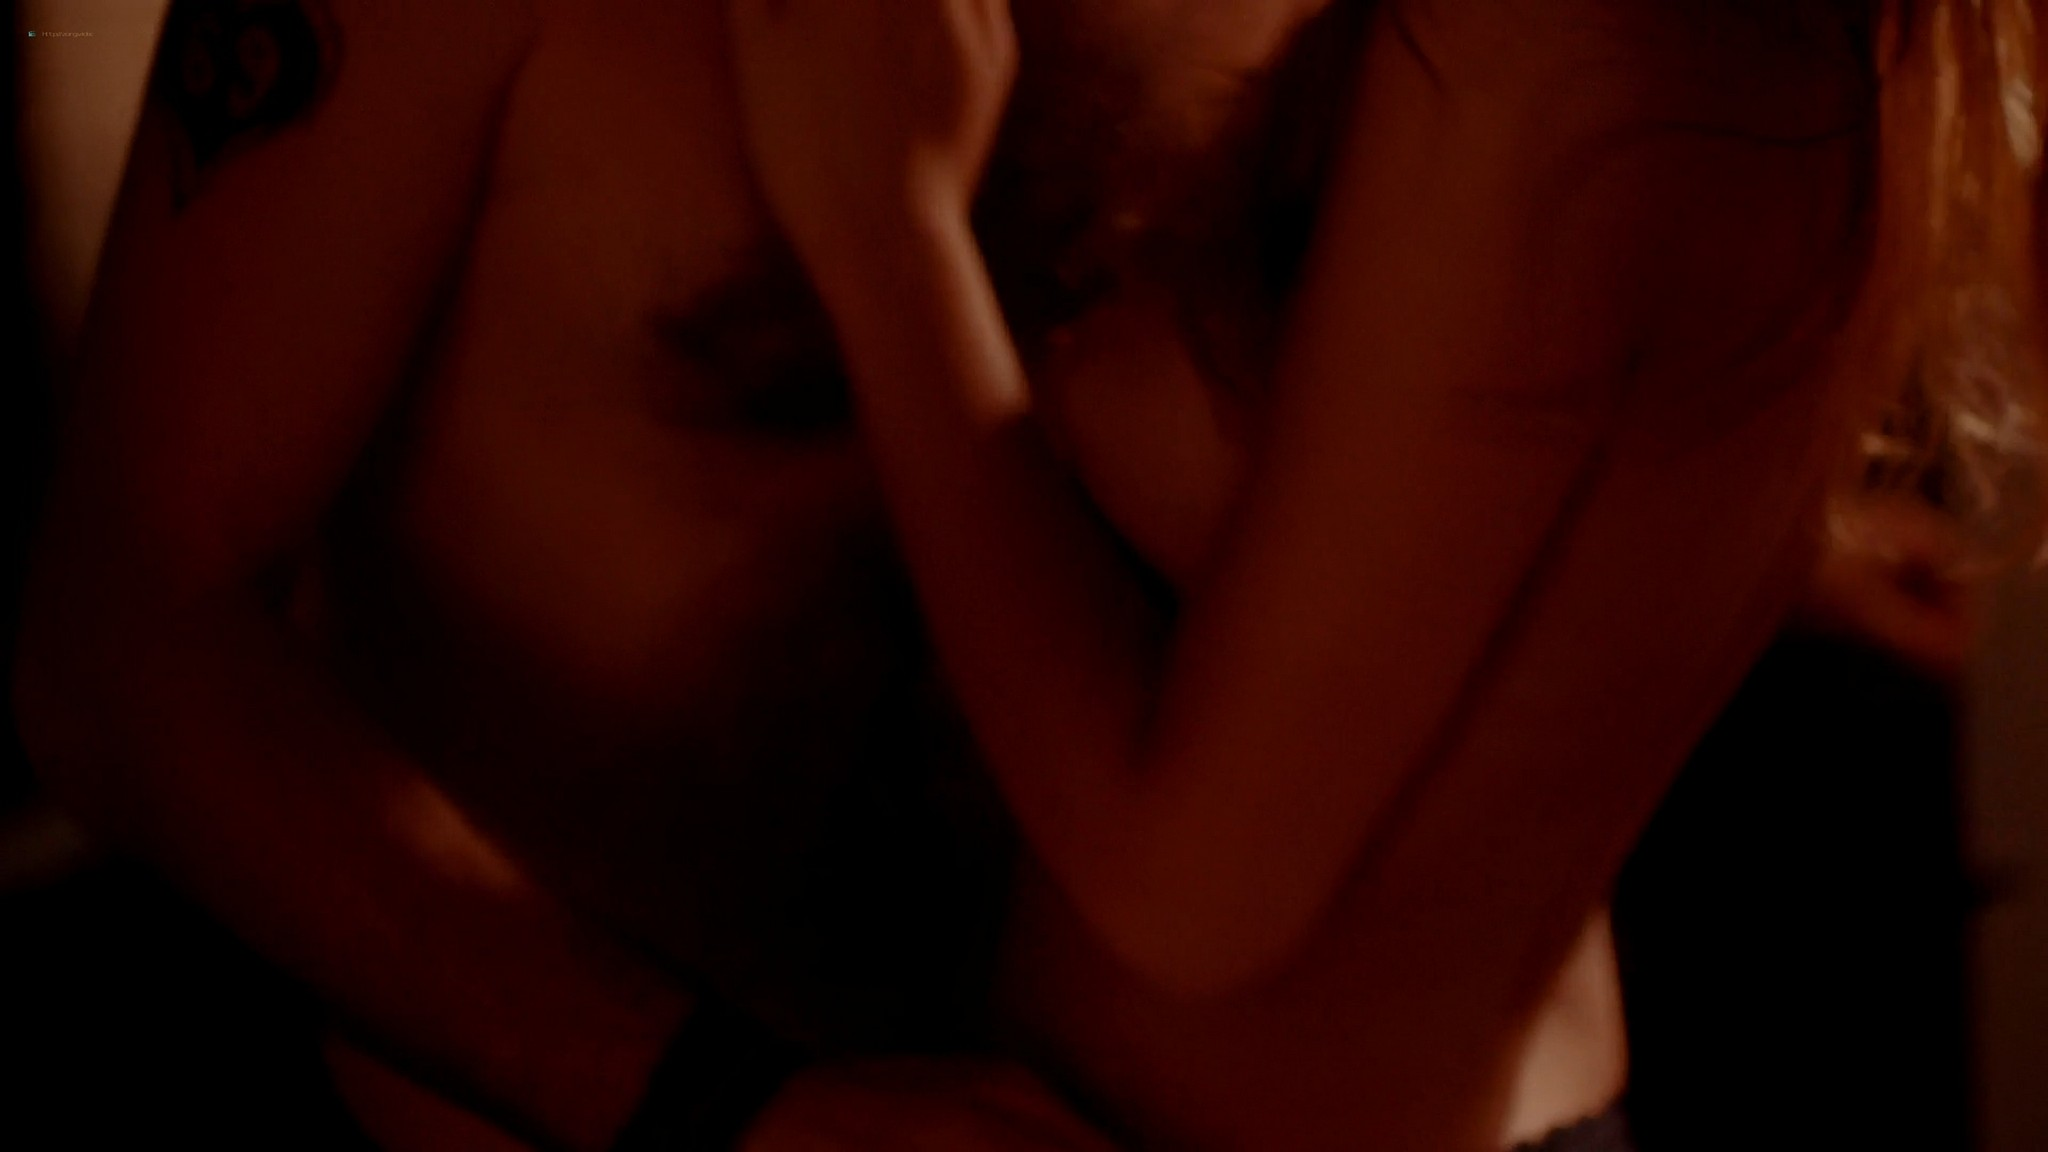 Maria Bakalova nude sex Yoanna Izabella Varbanova nude sex too Transgression BG 2018 HD 1080p Web 003